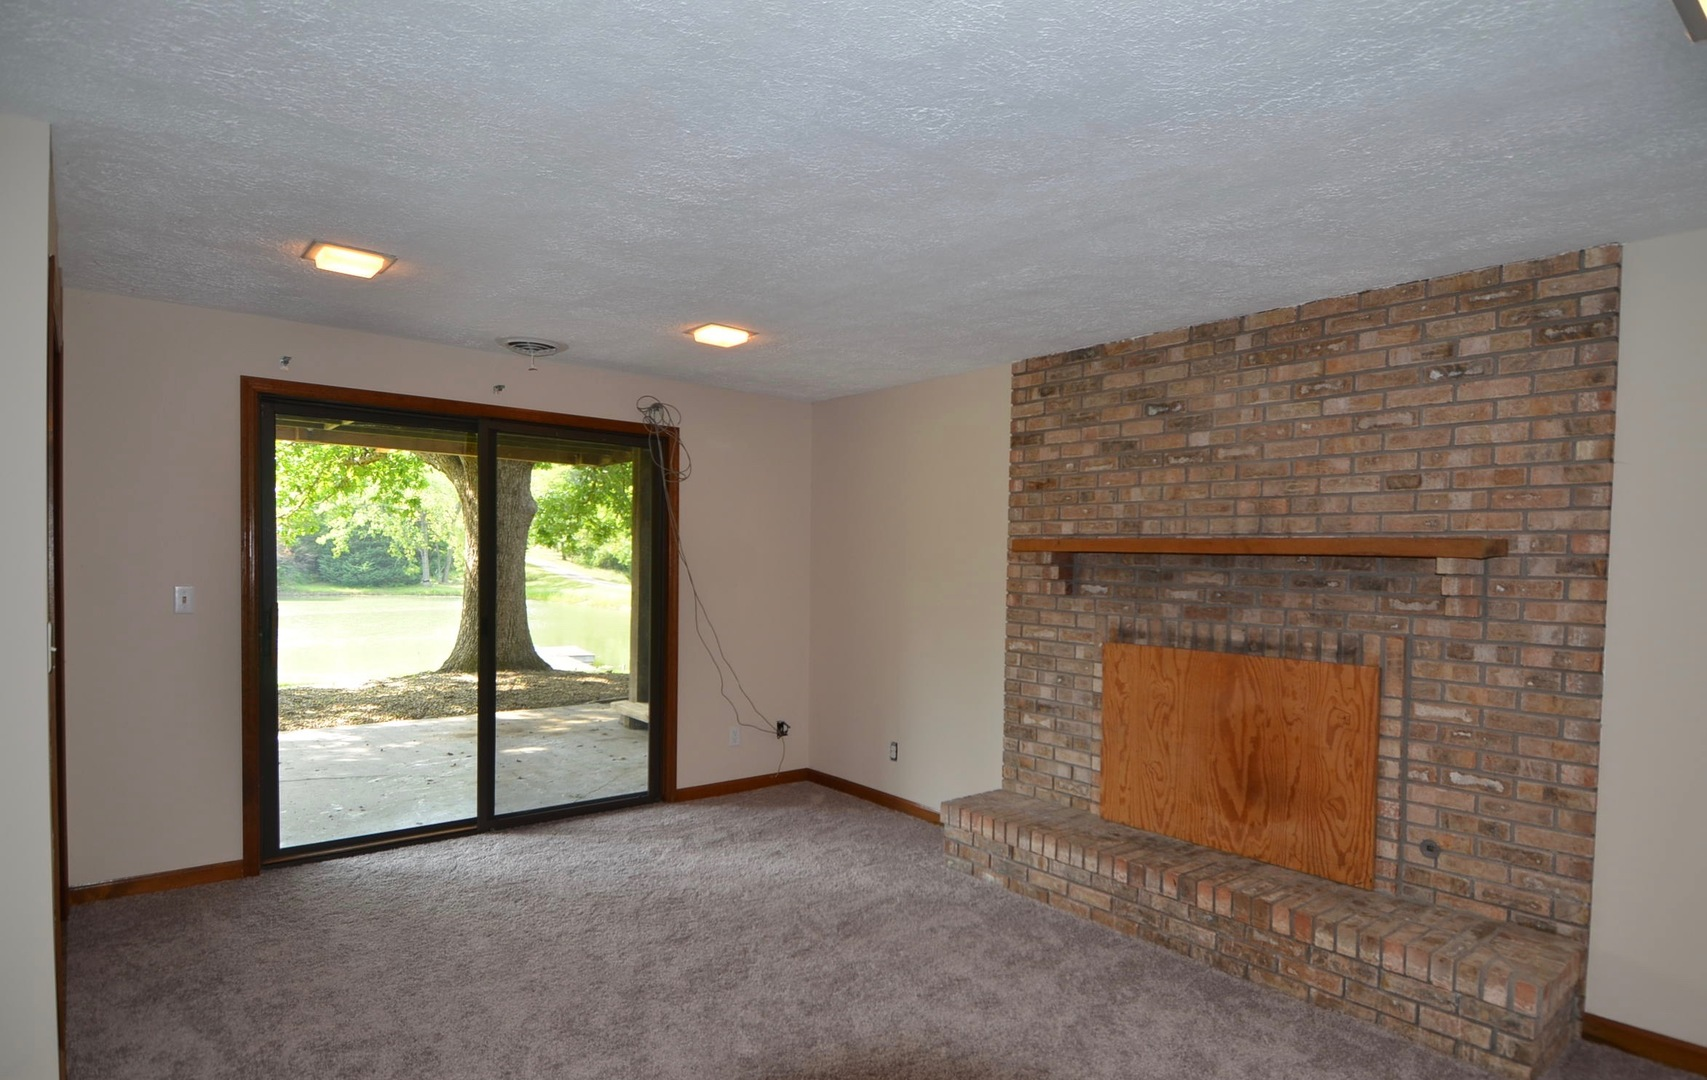 280 County Road 2225 E, Carlock, Illinois, 61725